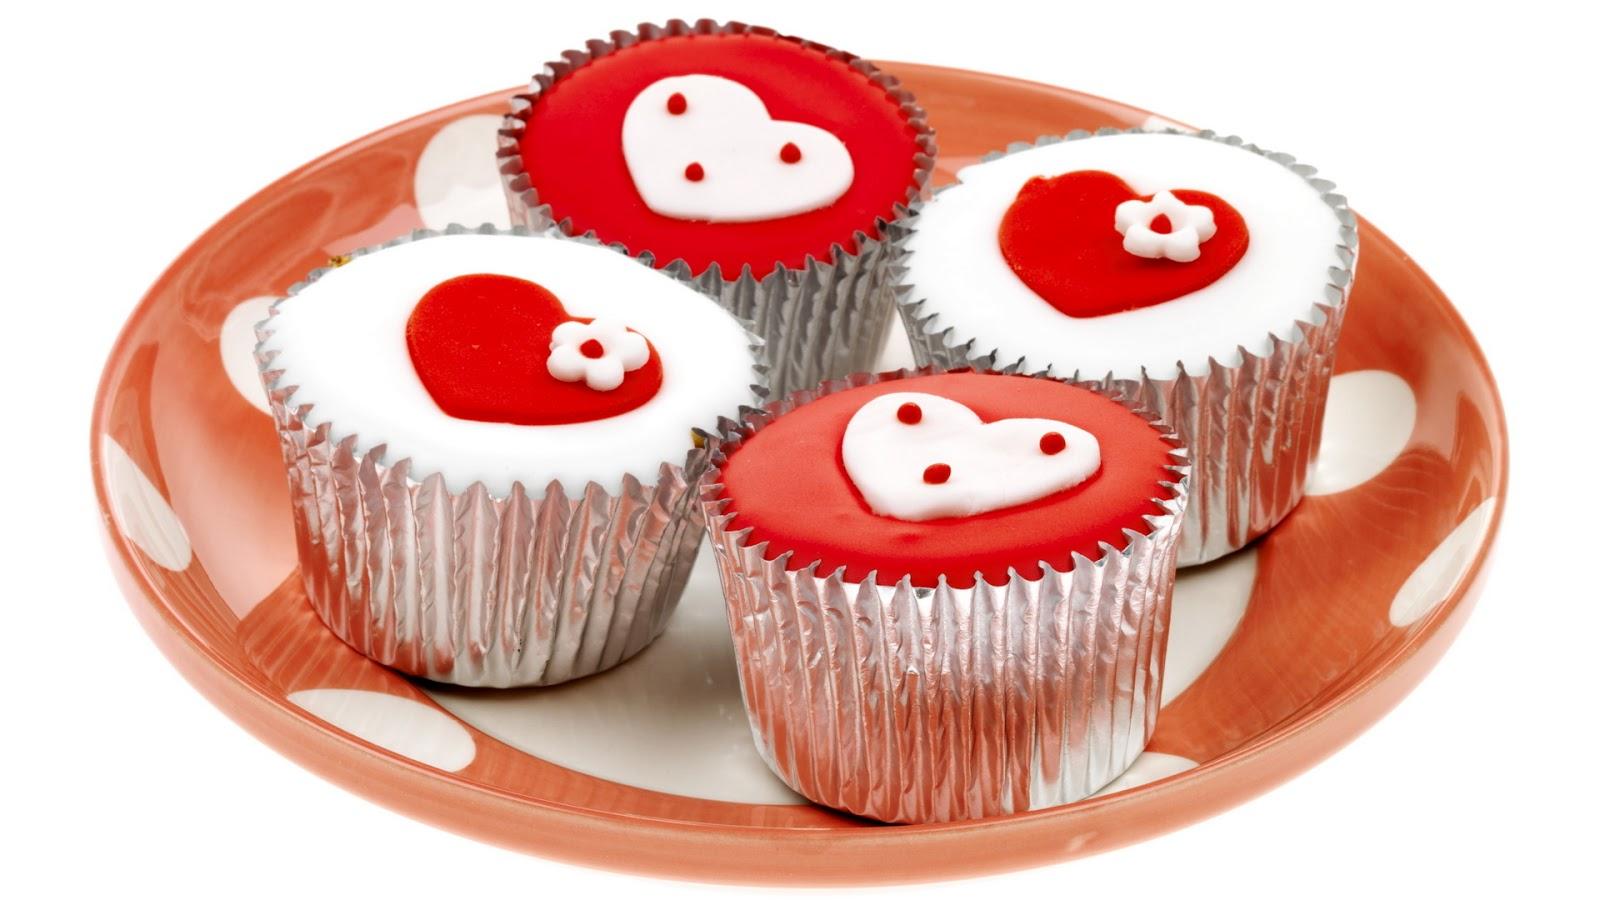 Fondos De Pantalla Gratis San Valentin 16: Fondo De Pantalla Dia De San Valentin Pasteles Corazones